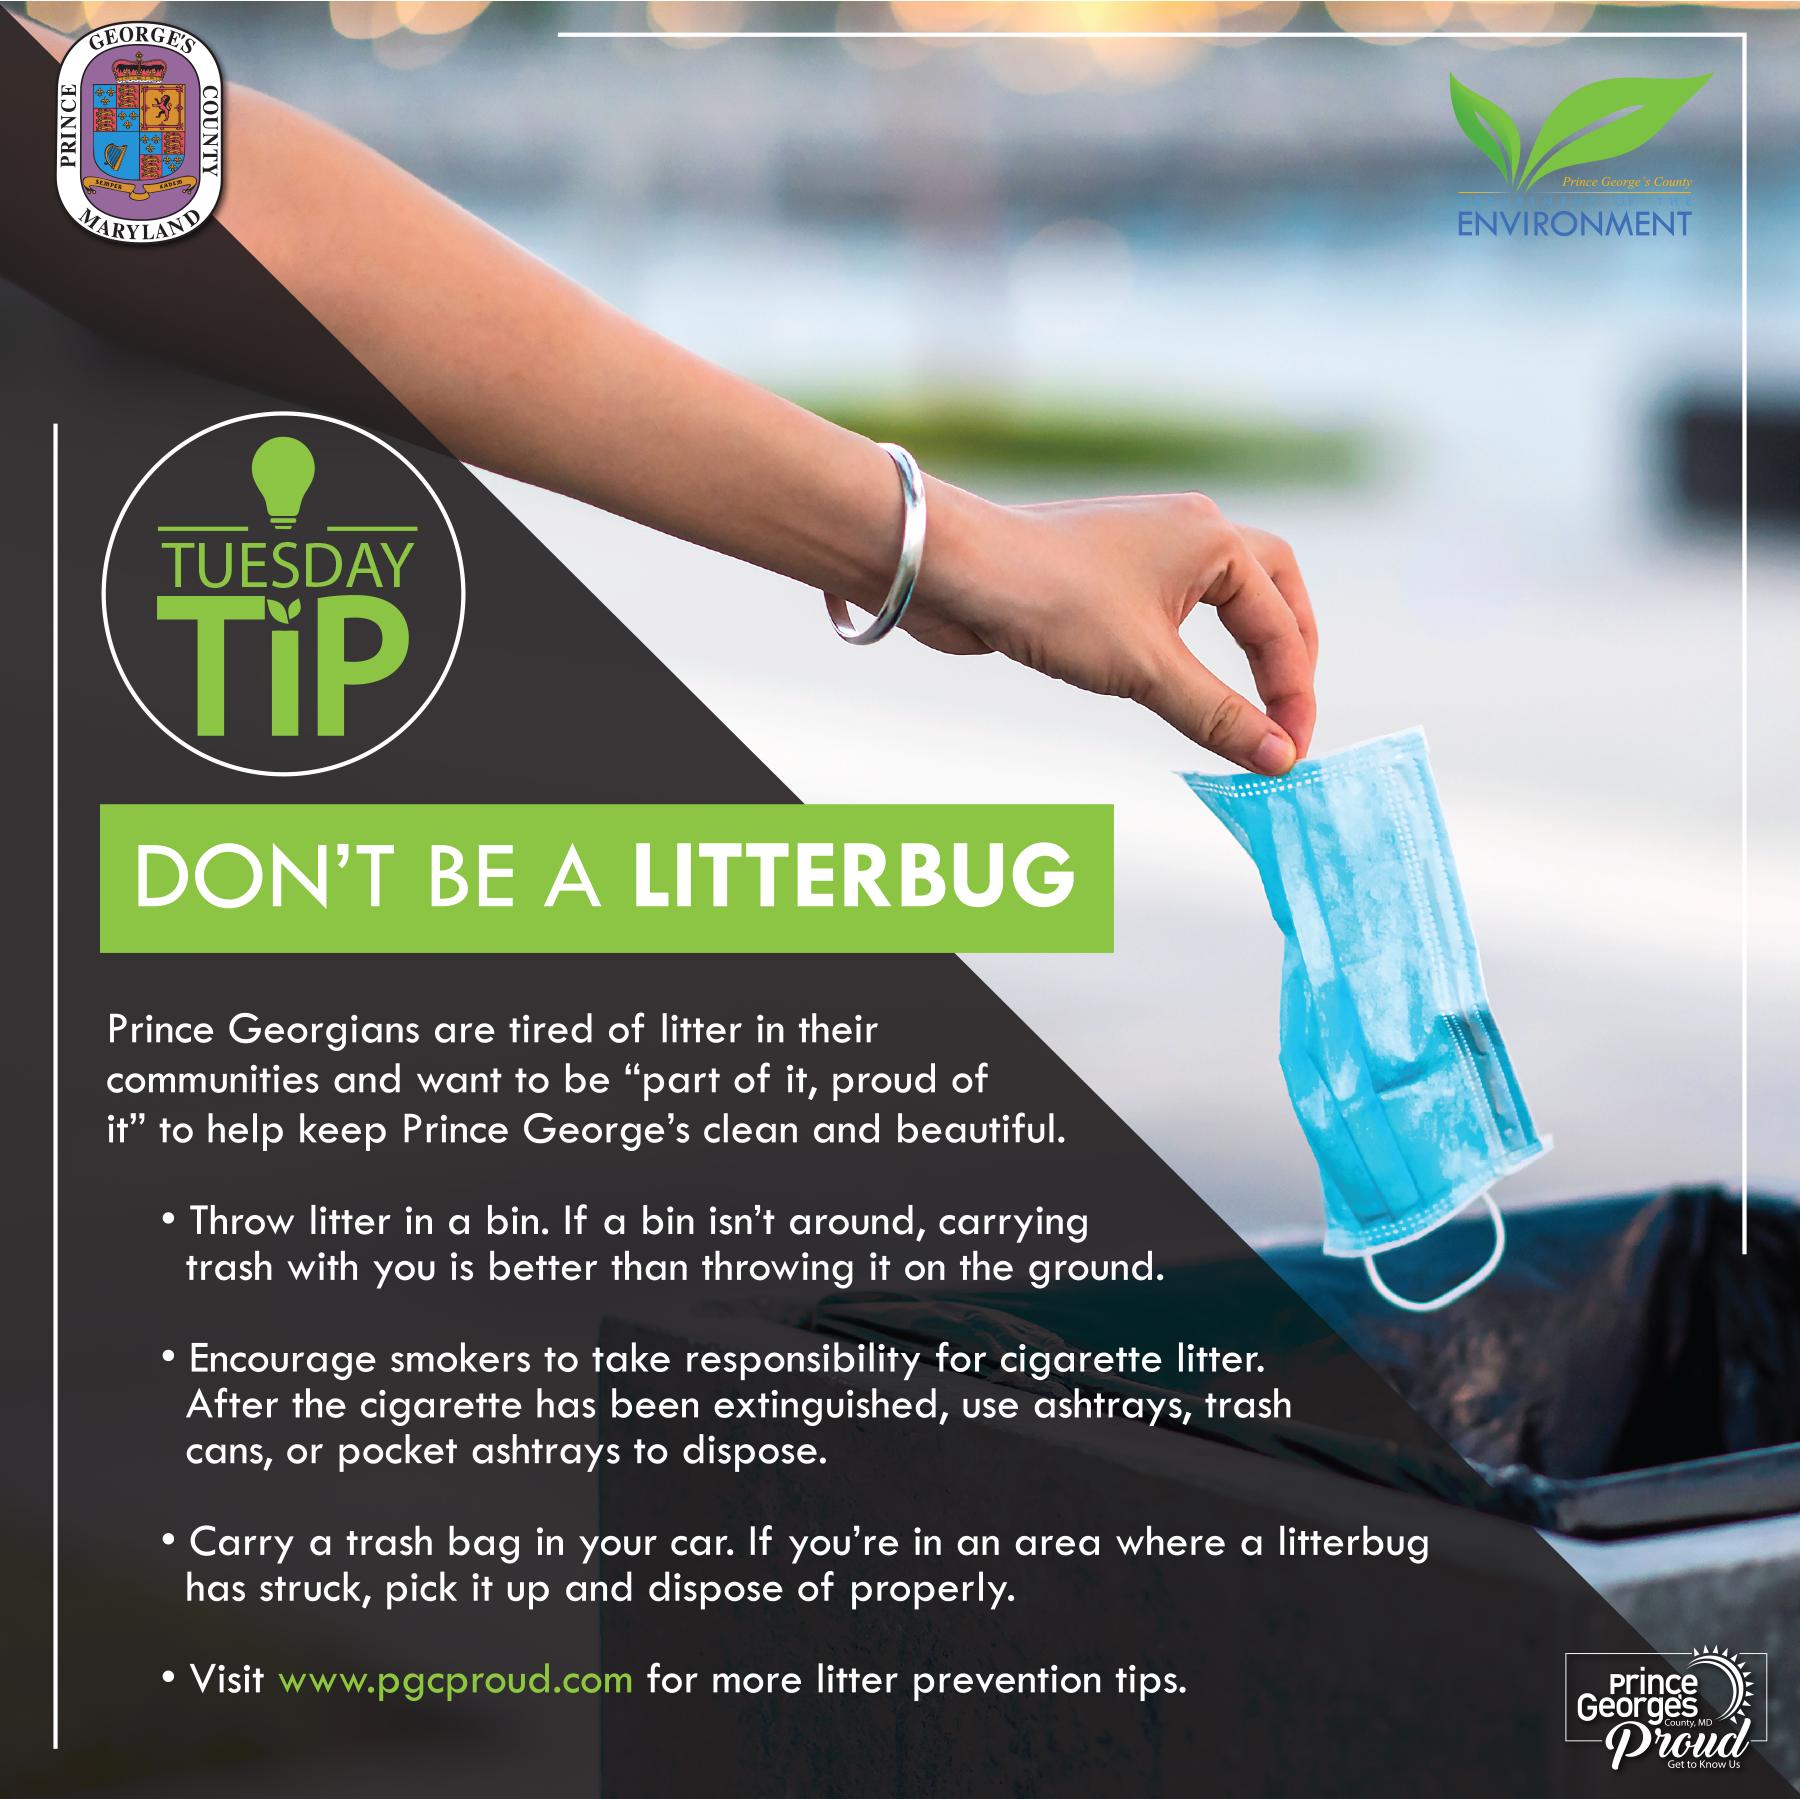 Tues Tip 6.15.21 litterbug eng